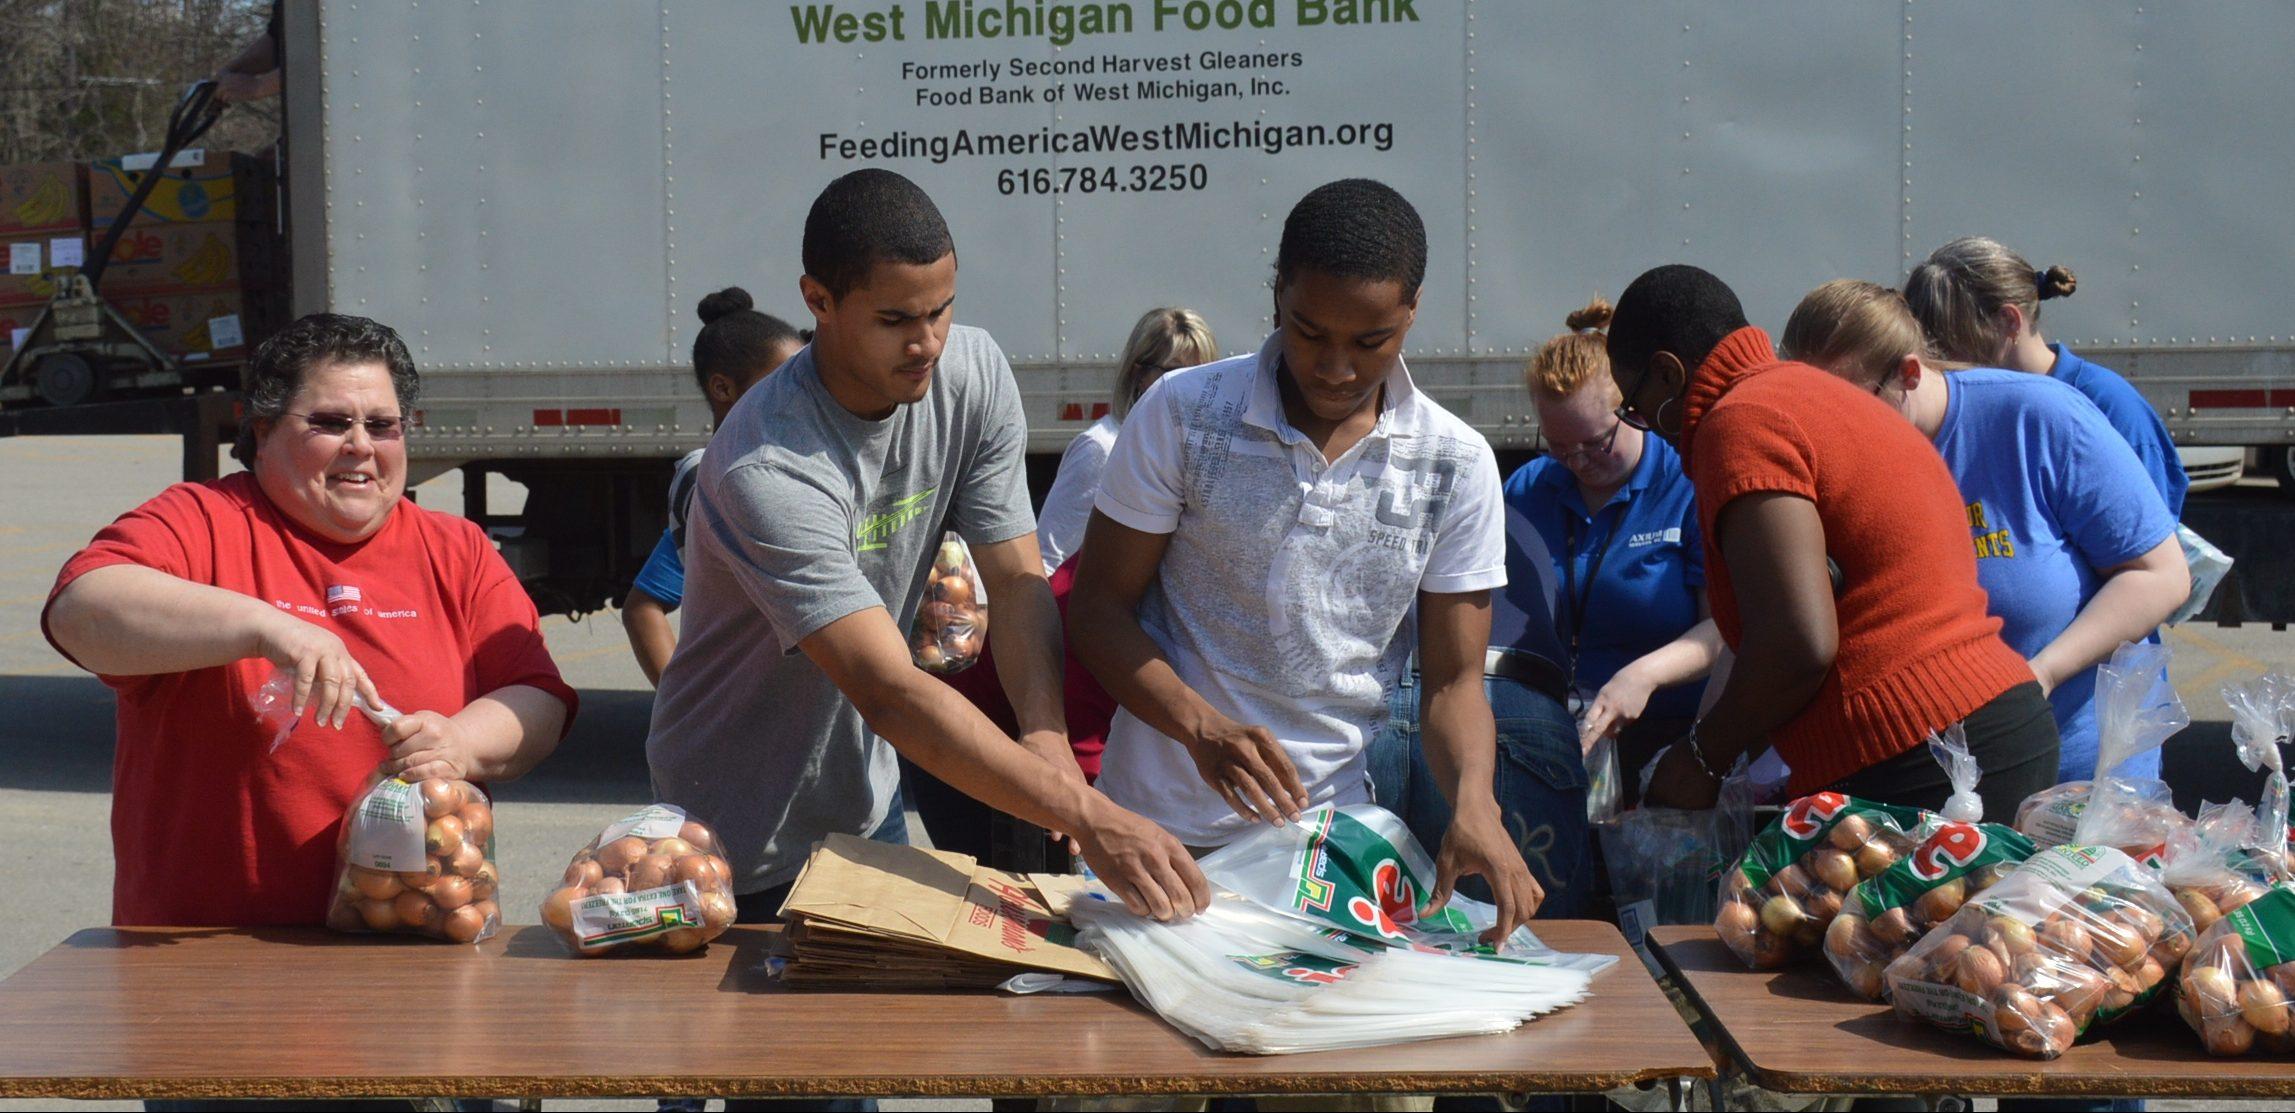 West Michigan Food Bank: helping neighbors achieve a fresh start